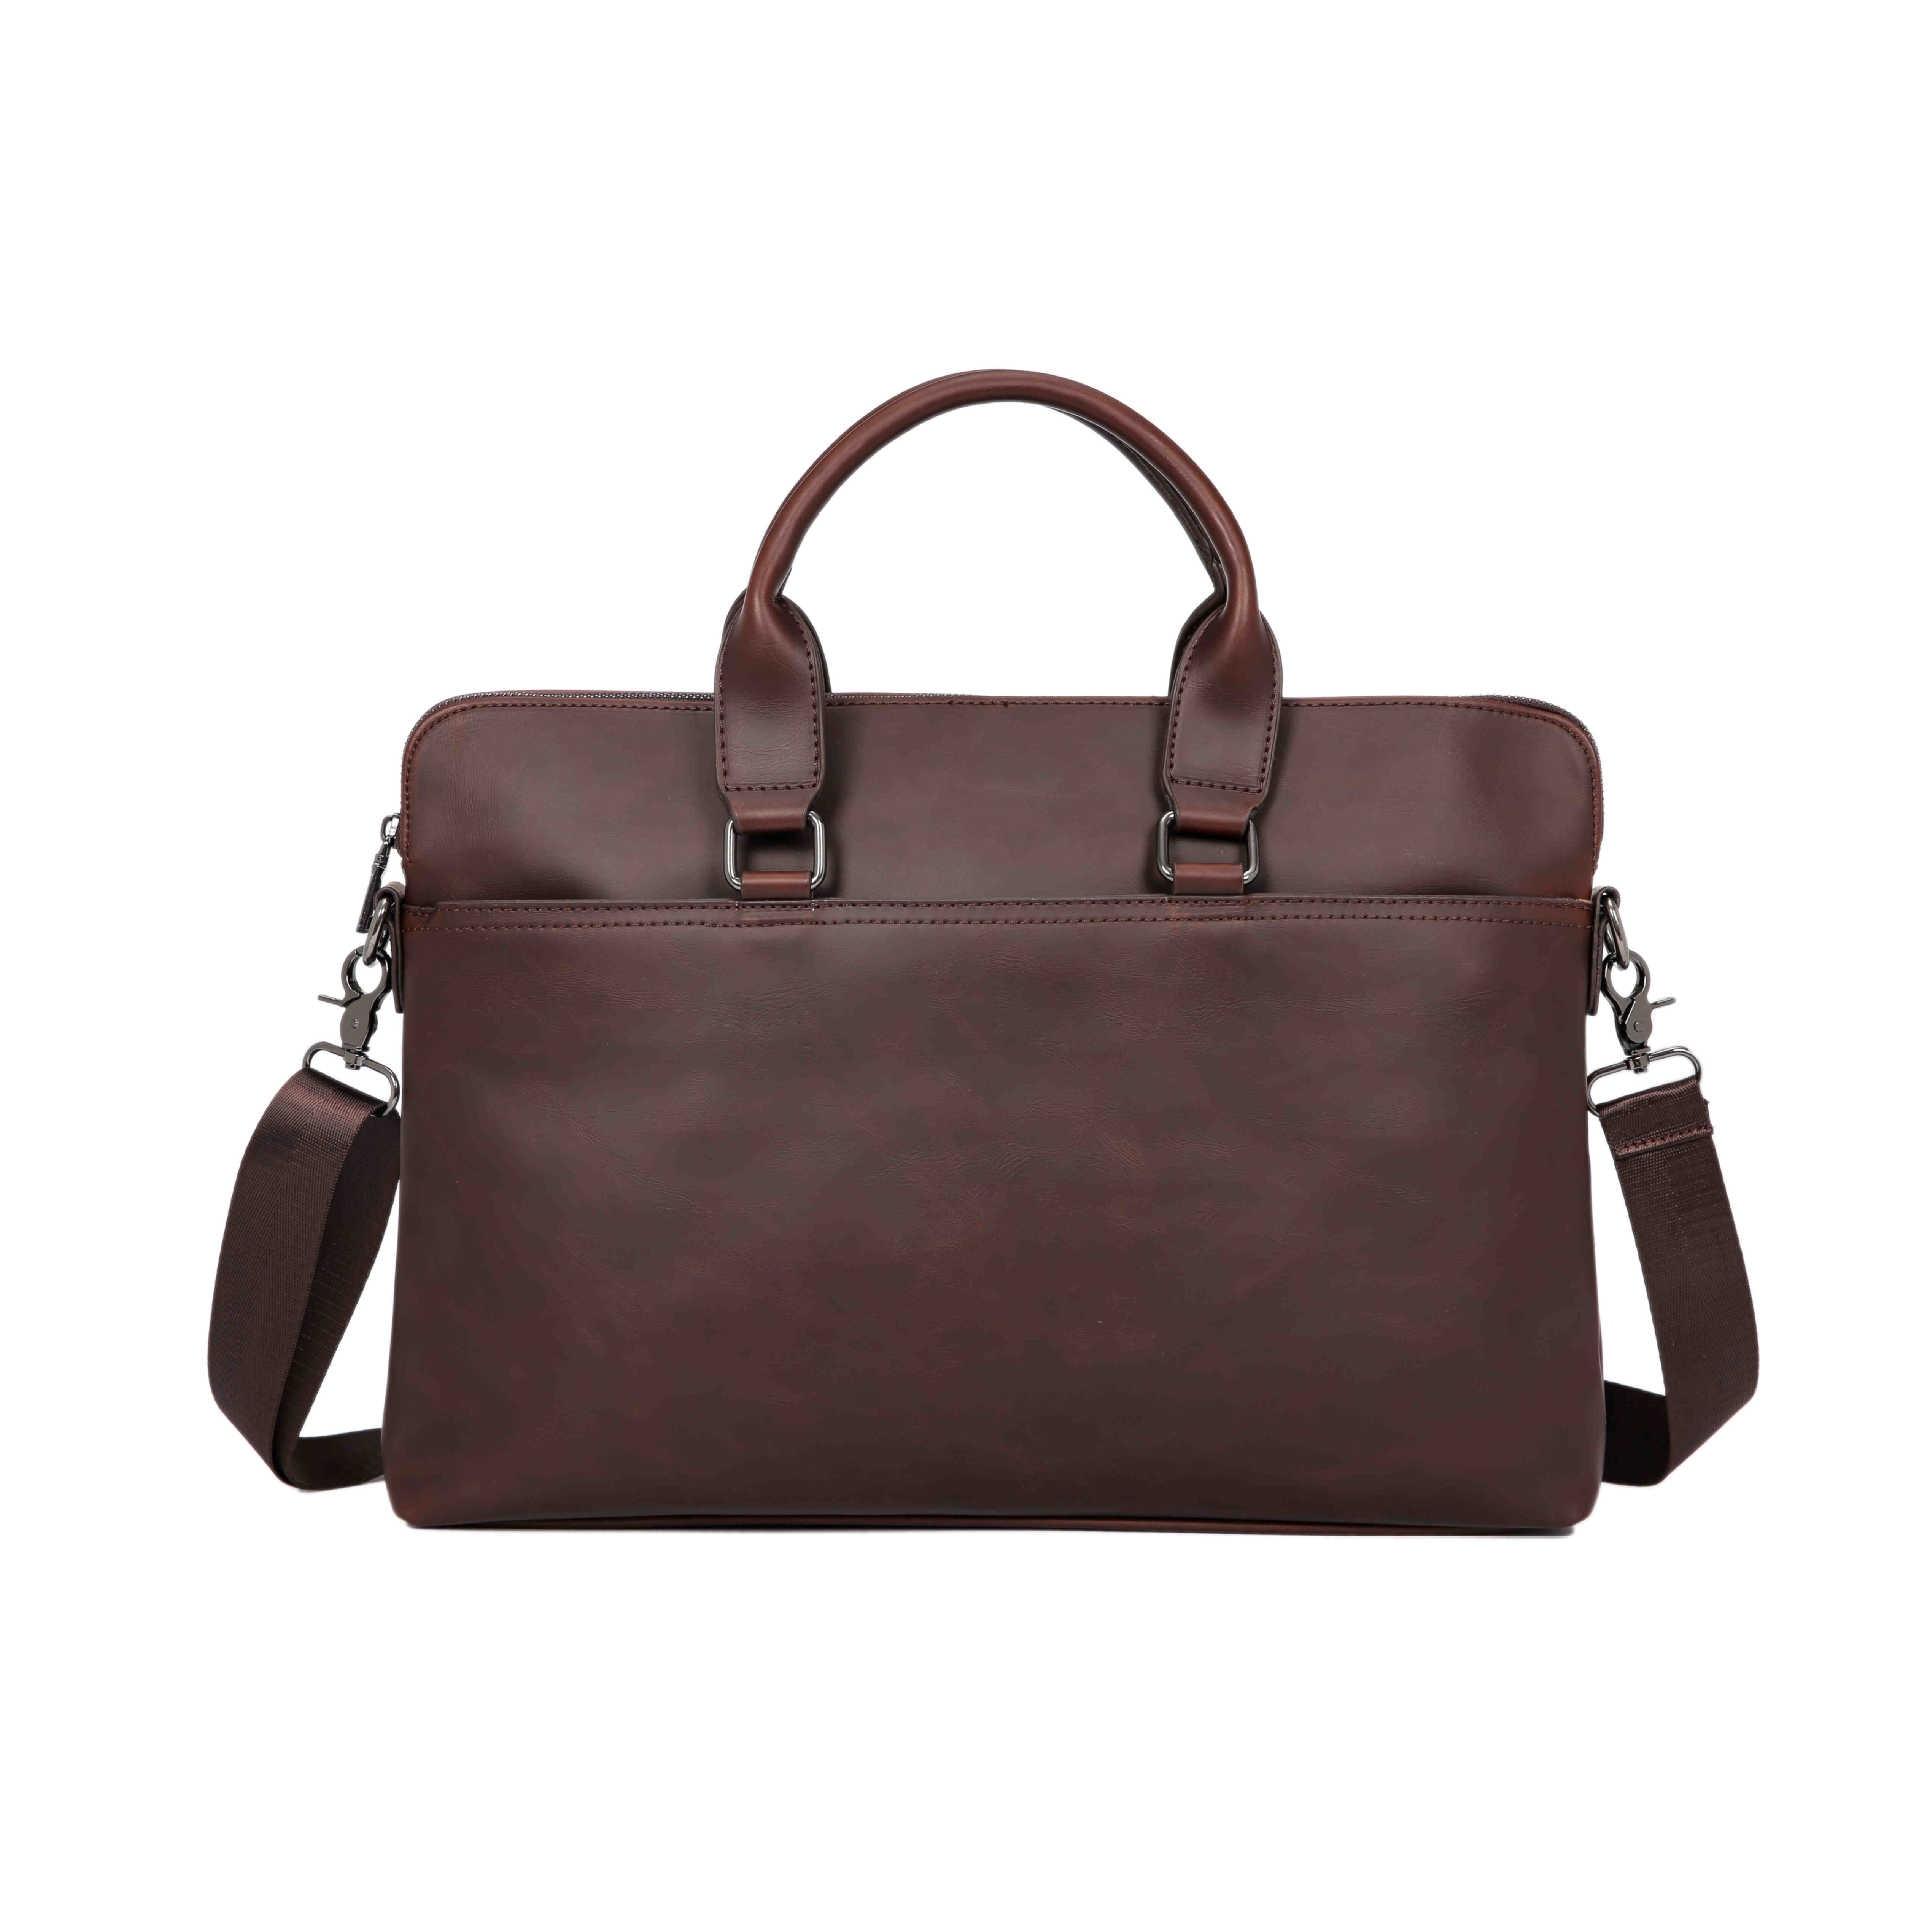 New Style Korean-style Shoulder Bag Briefcase Retro Xie Bao Office Men's Handbag MEN'S Bag Briefcase Fashion